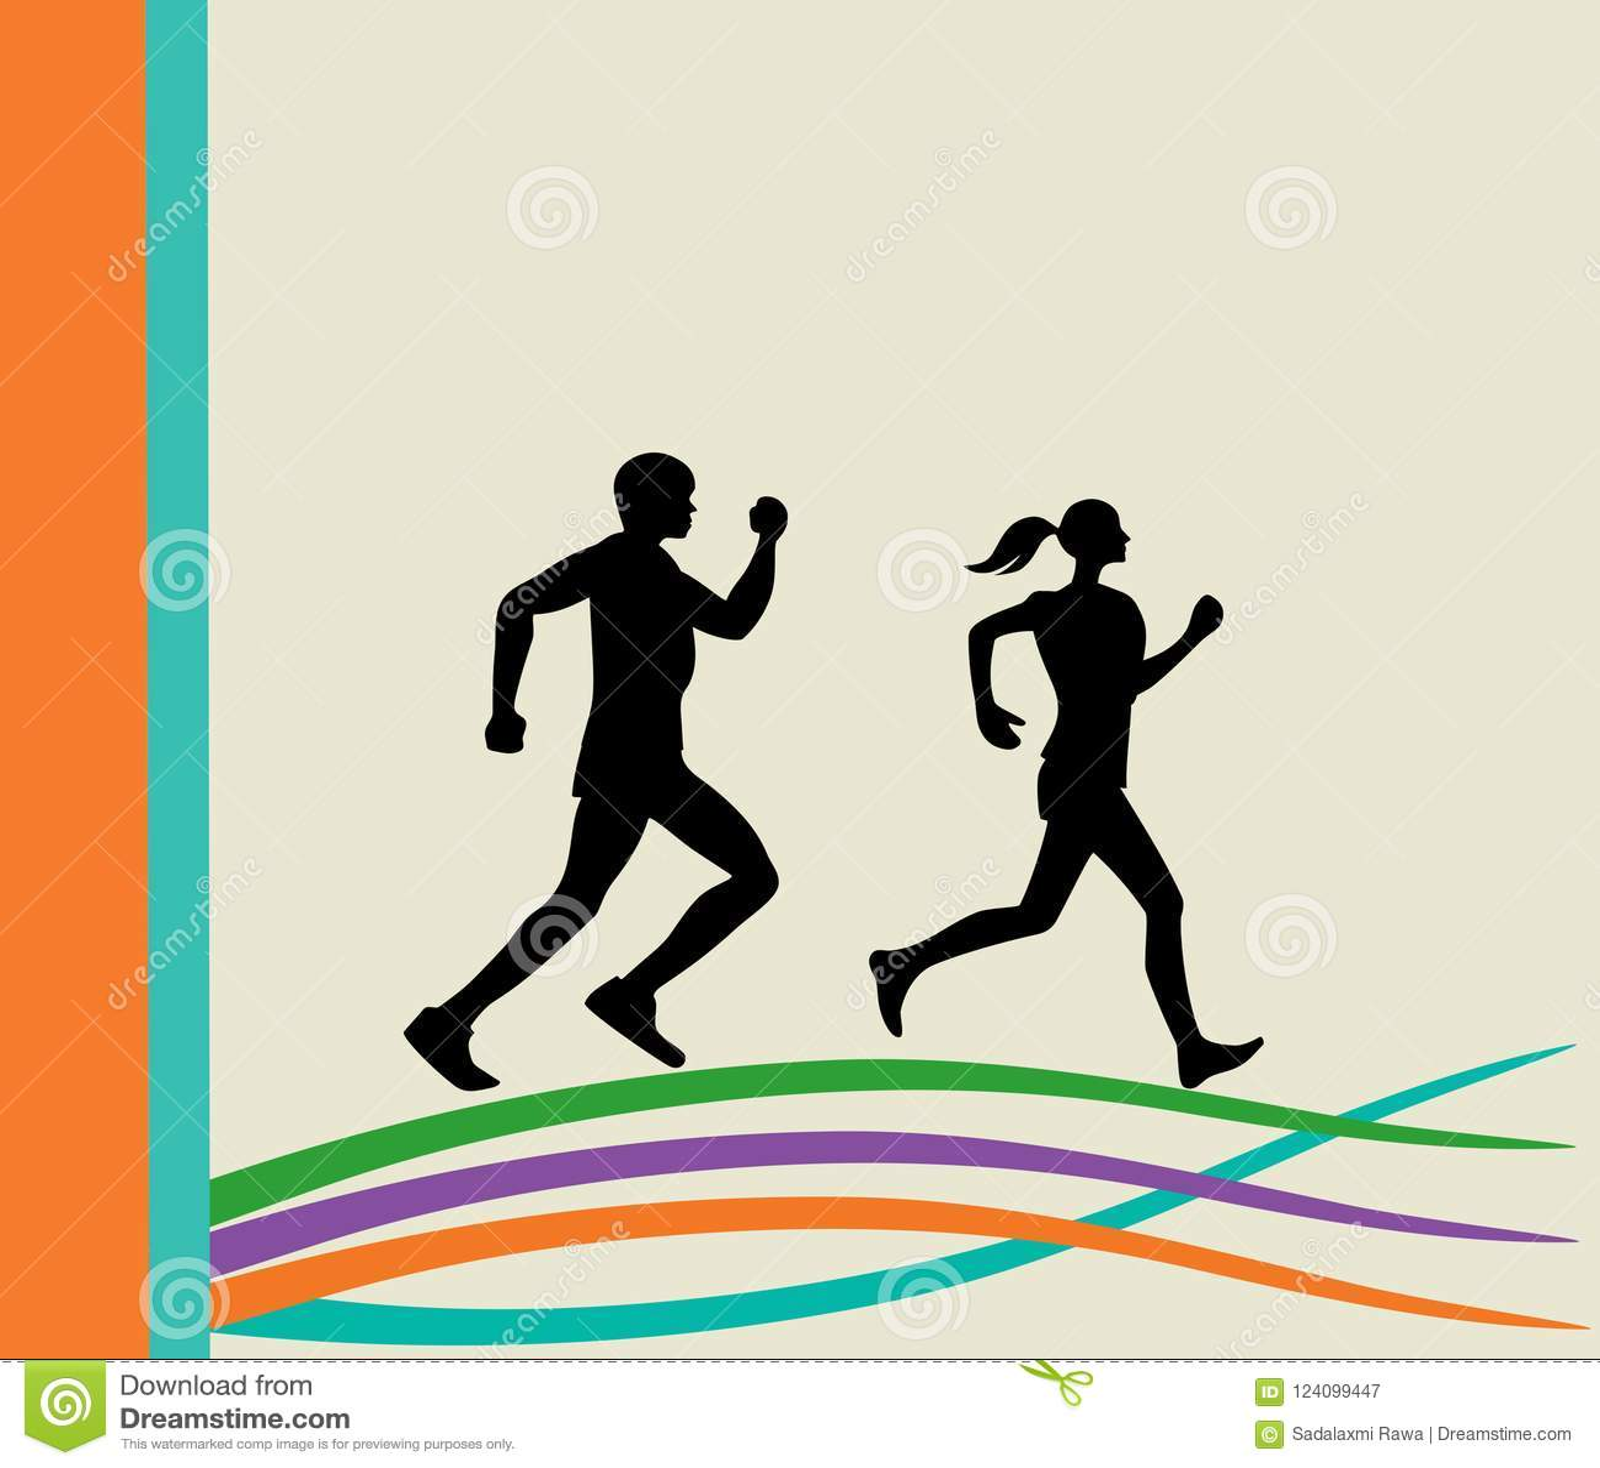 Running people silhouette